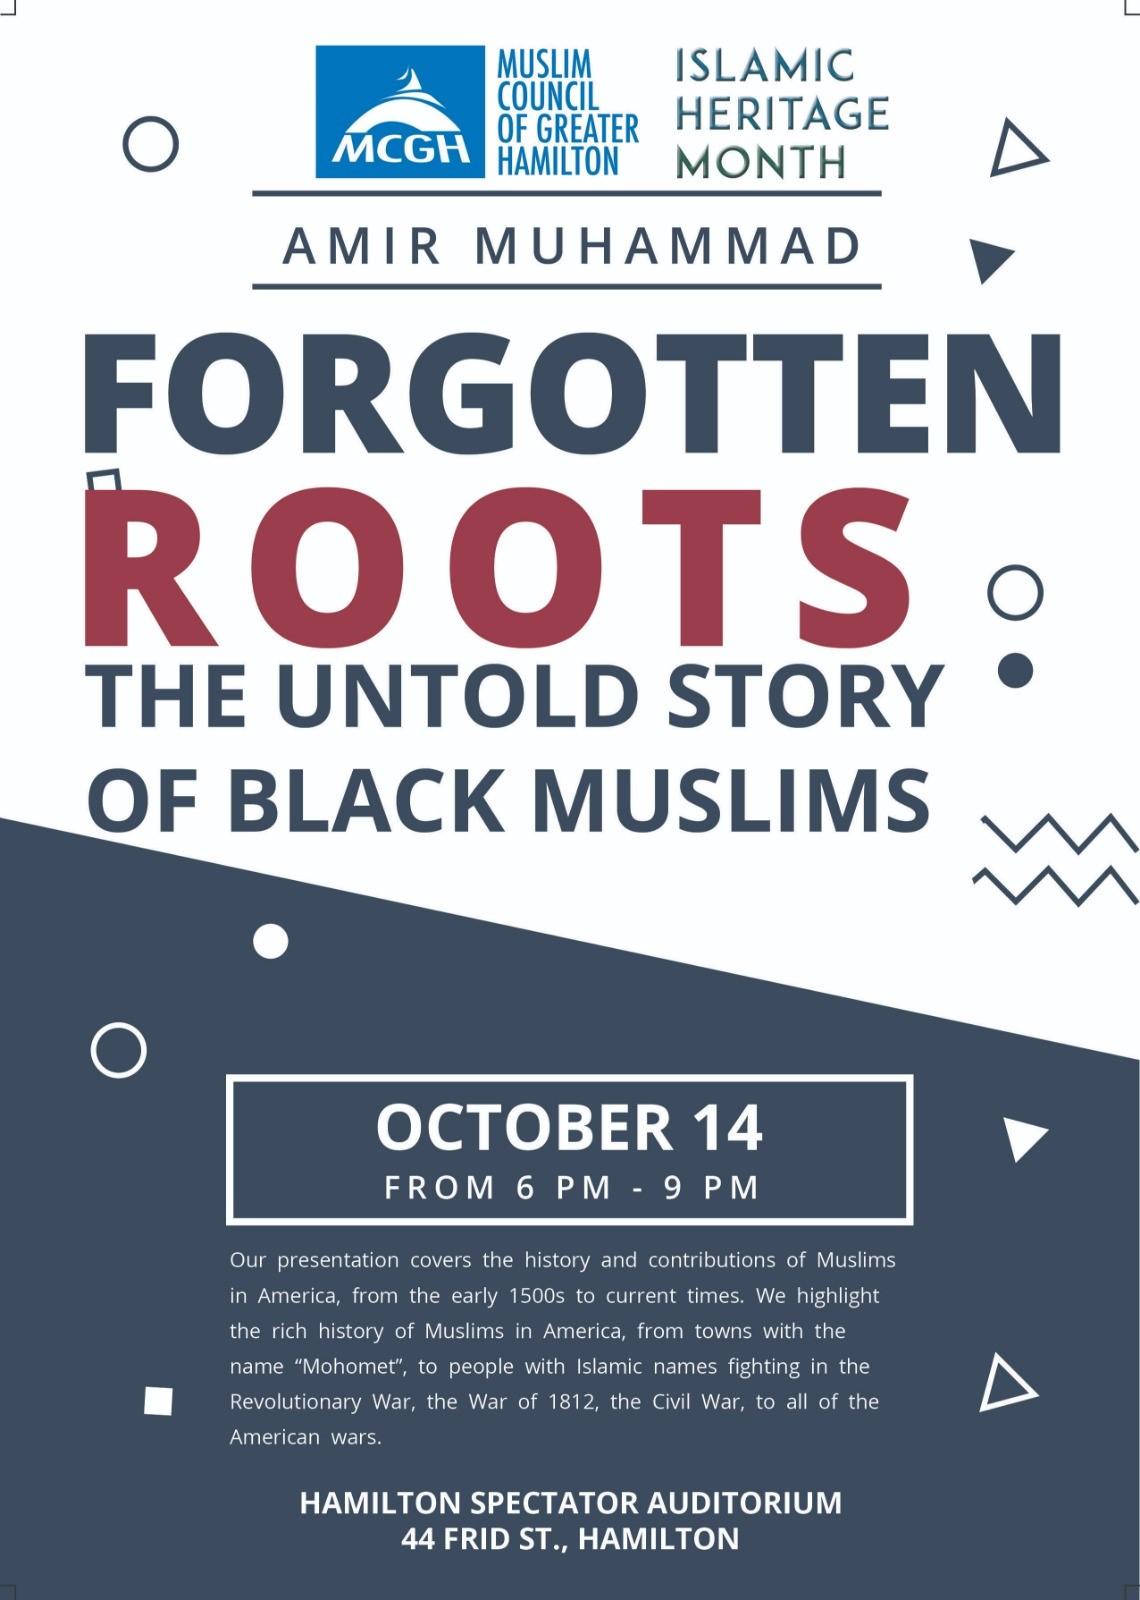 IHM - Amir Muhammad